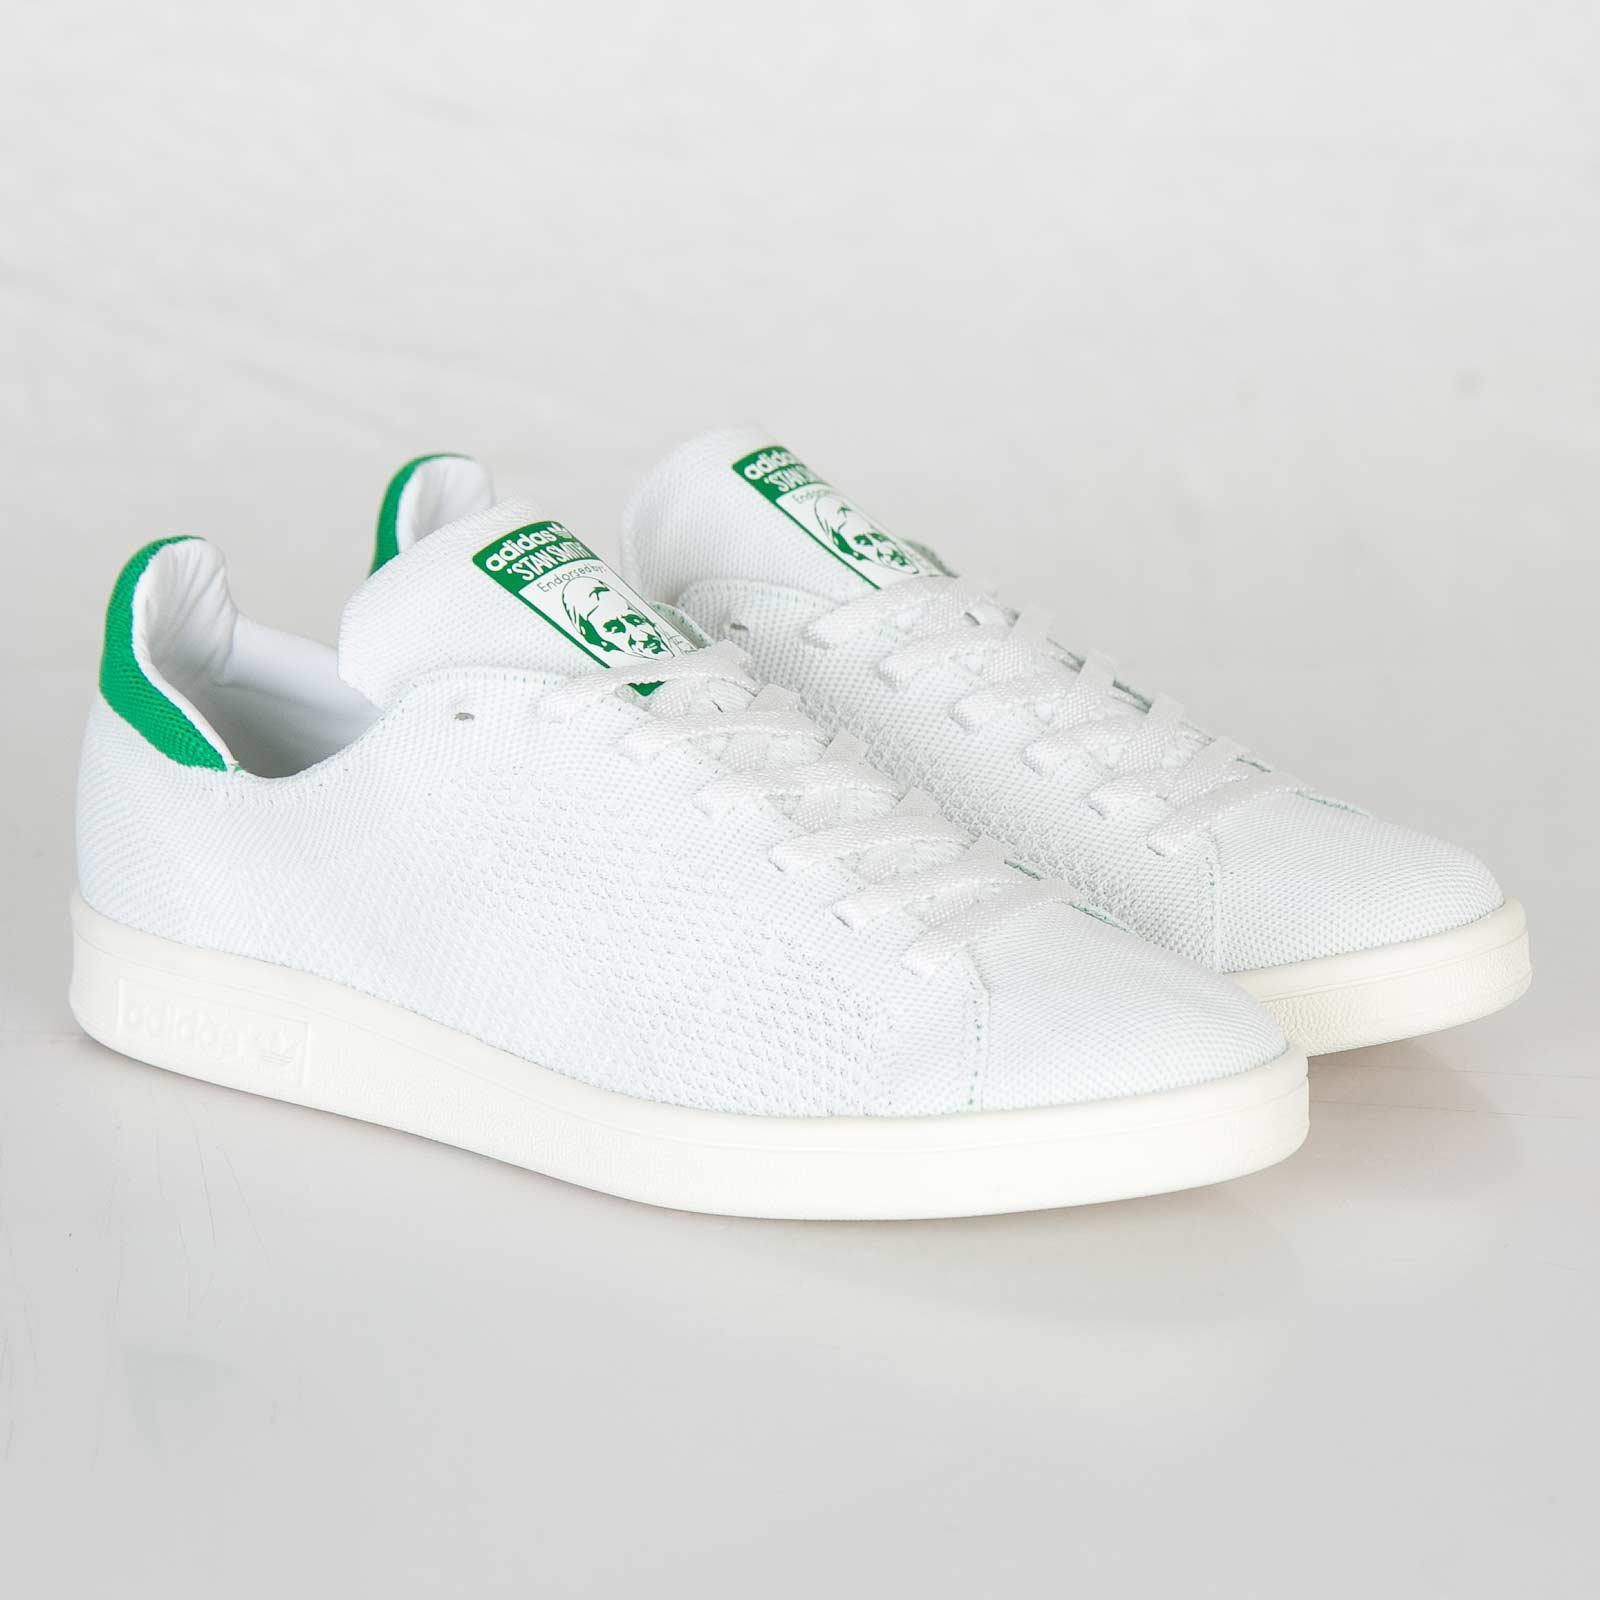 adidas stan smith primeknit m21960 sneakersnstuff scarpe